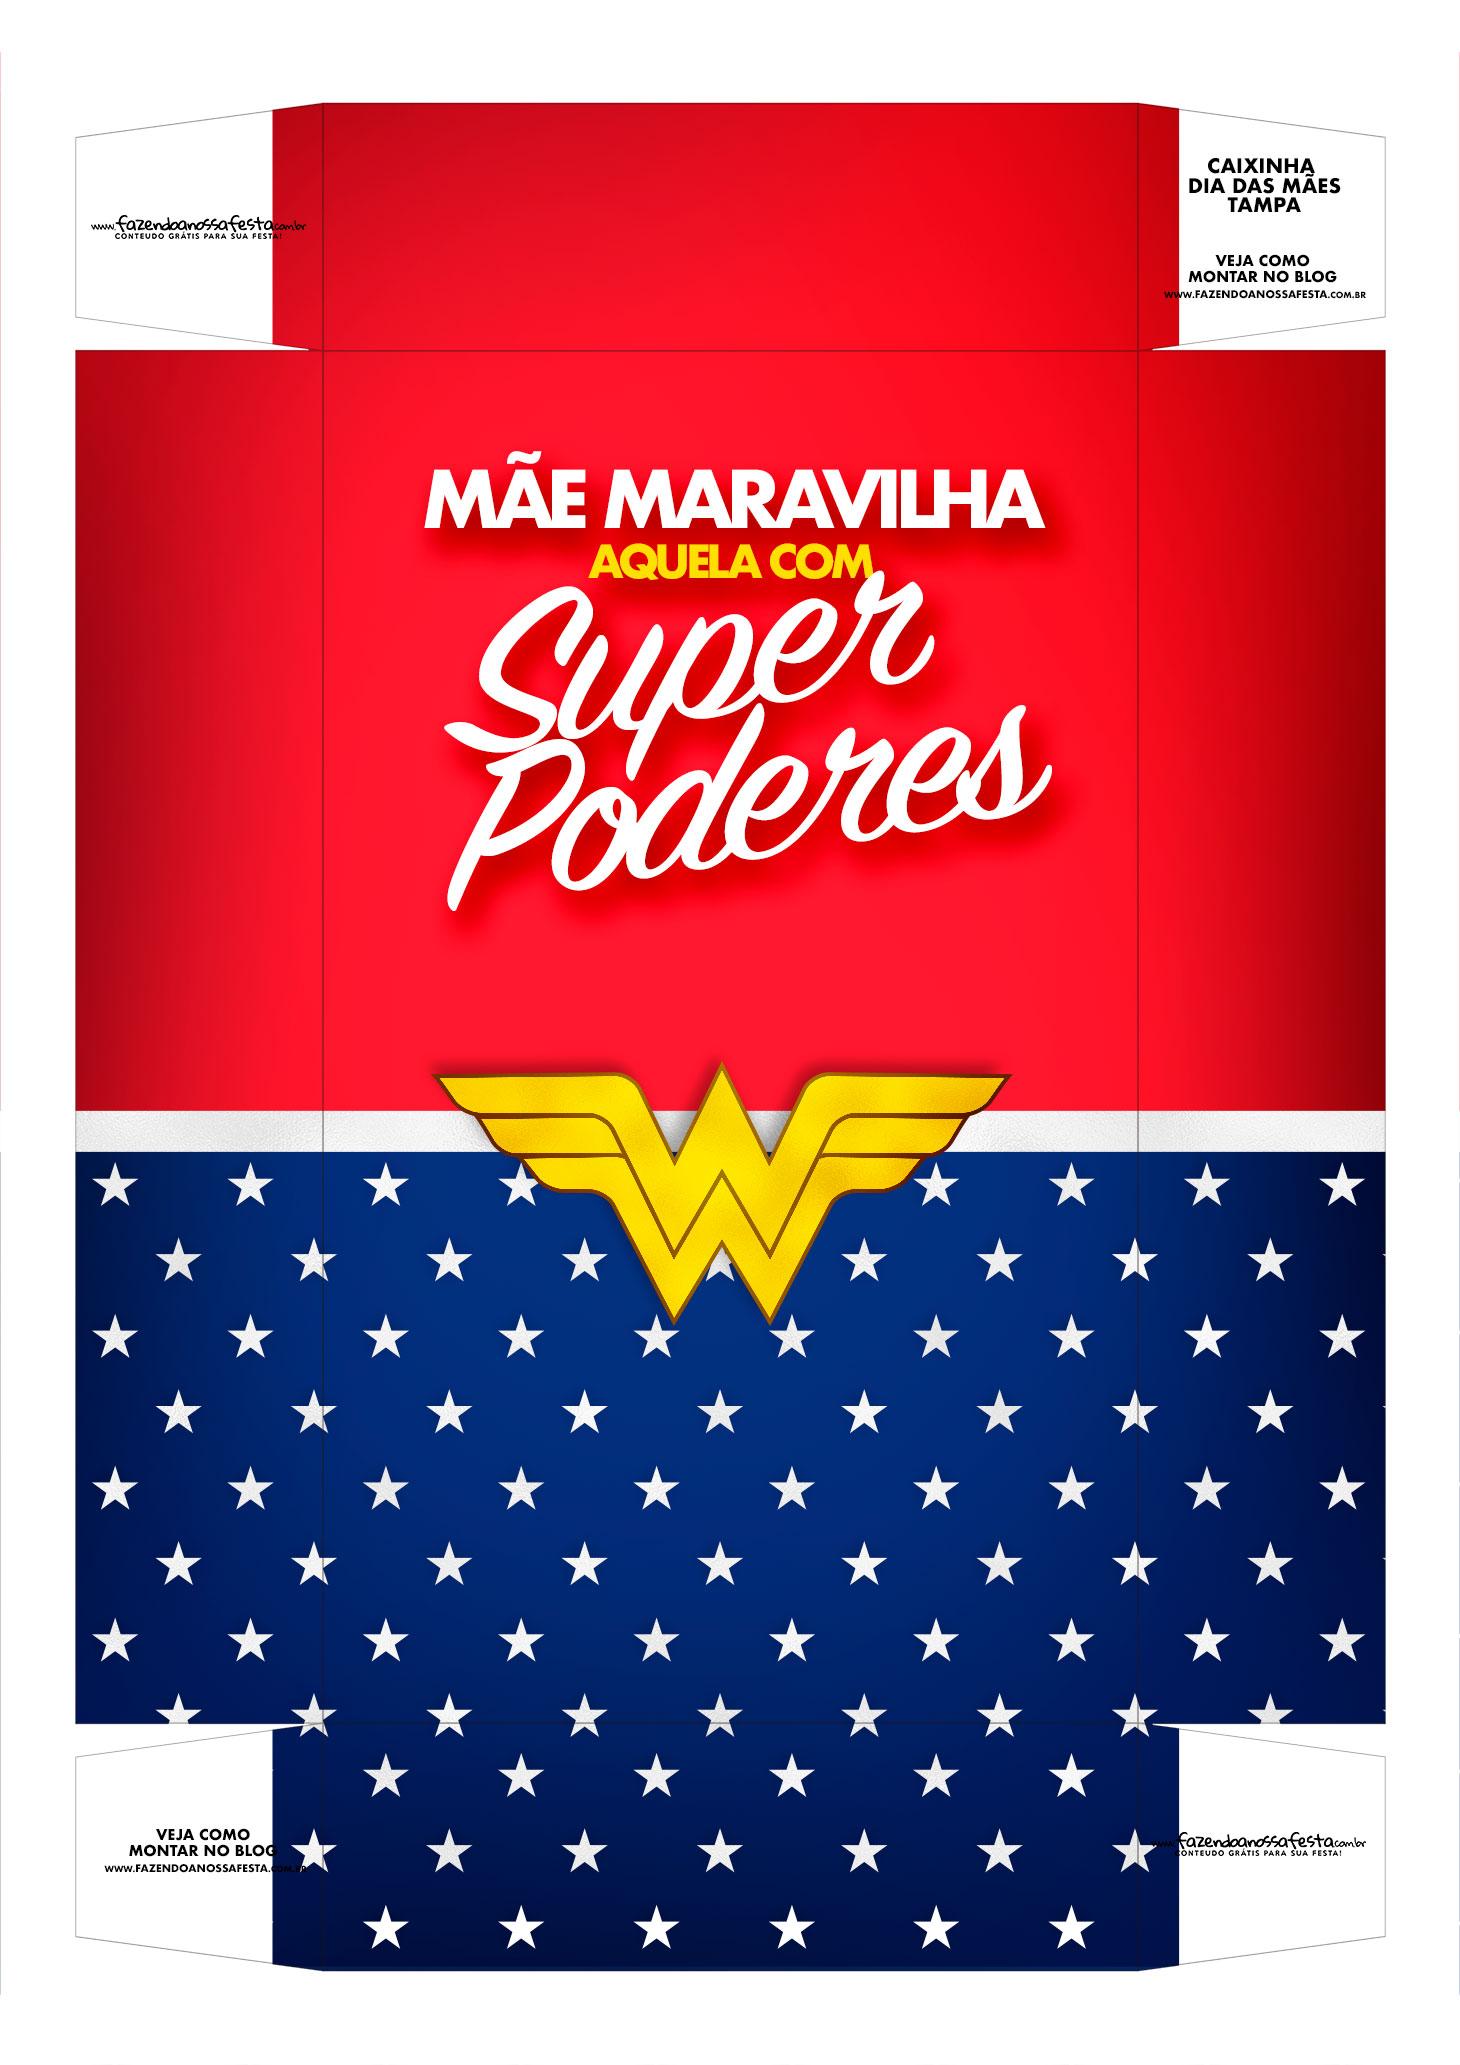 Caixa personalizada Mae Maravilha tampa